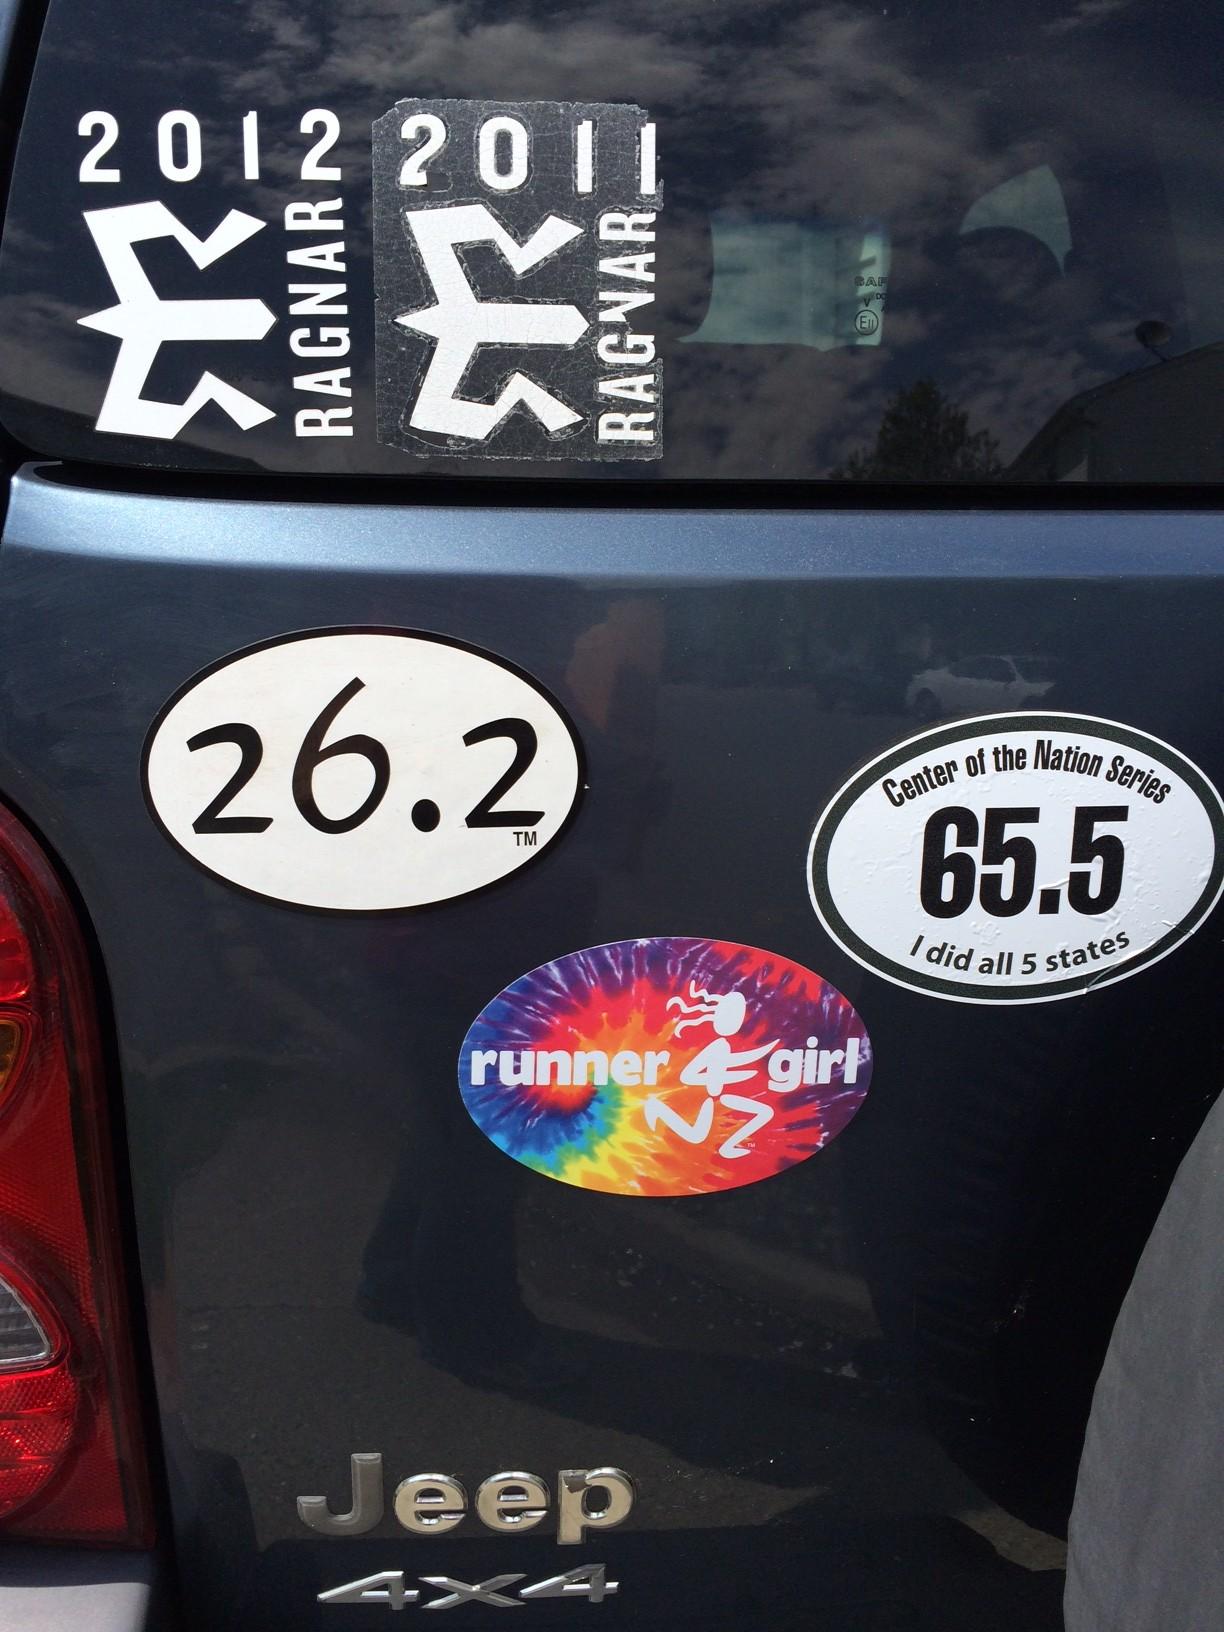 Dicks Sporting Goods Car Magnets